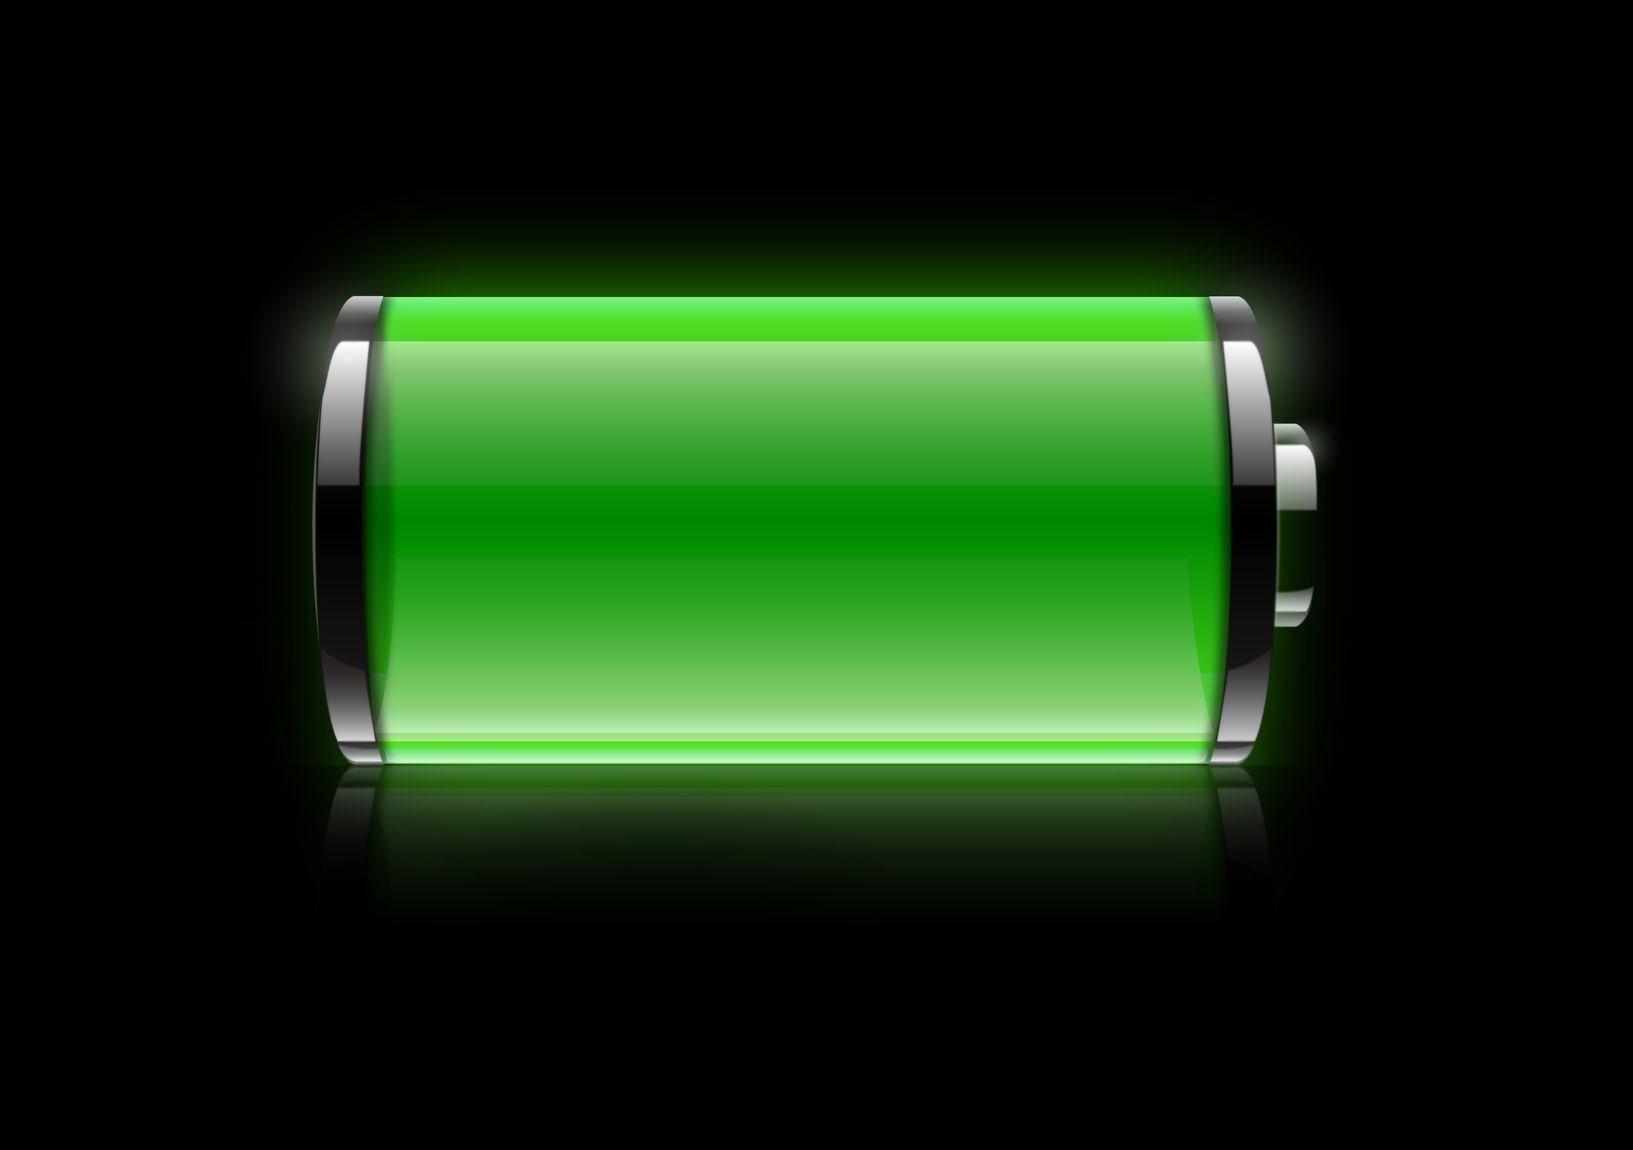 картинка индикатор заряда батареи группа заранее попросила